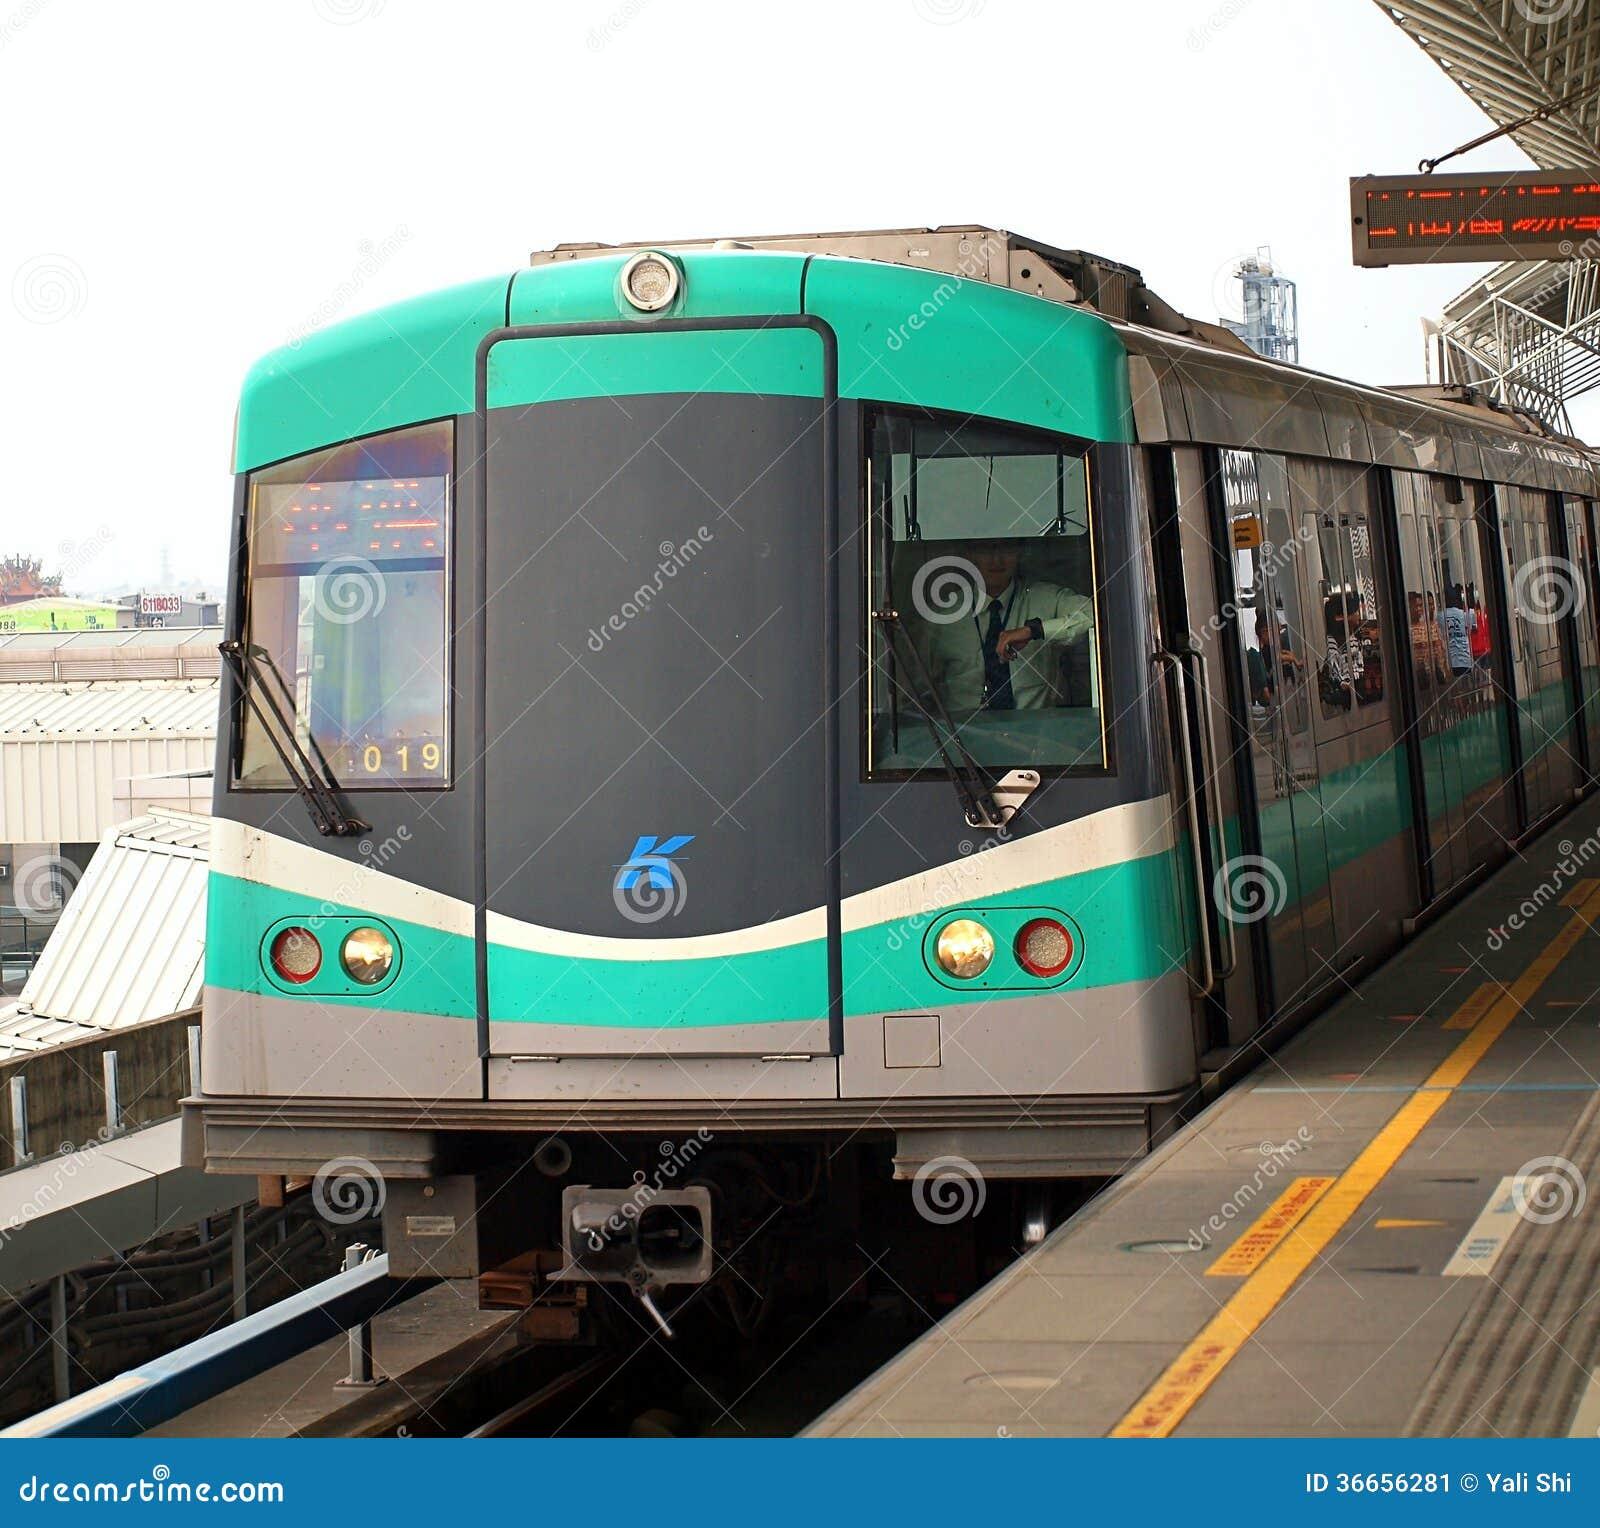 mass rapid transit system pdf